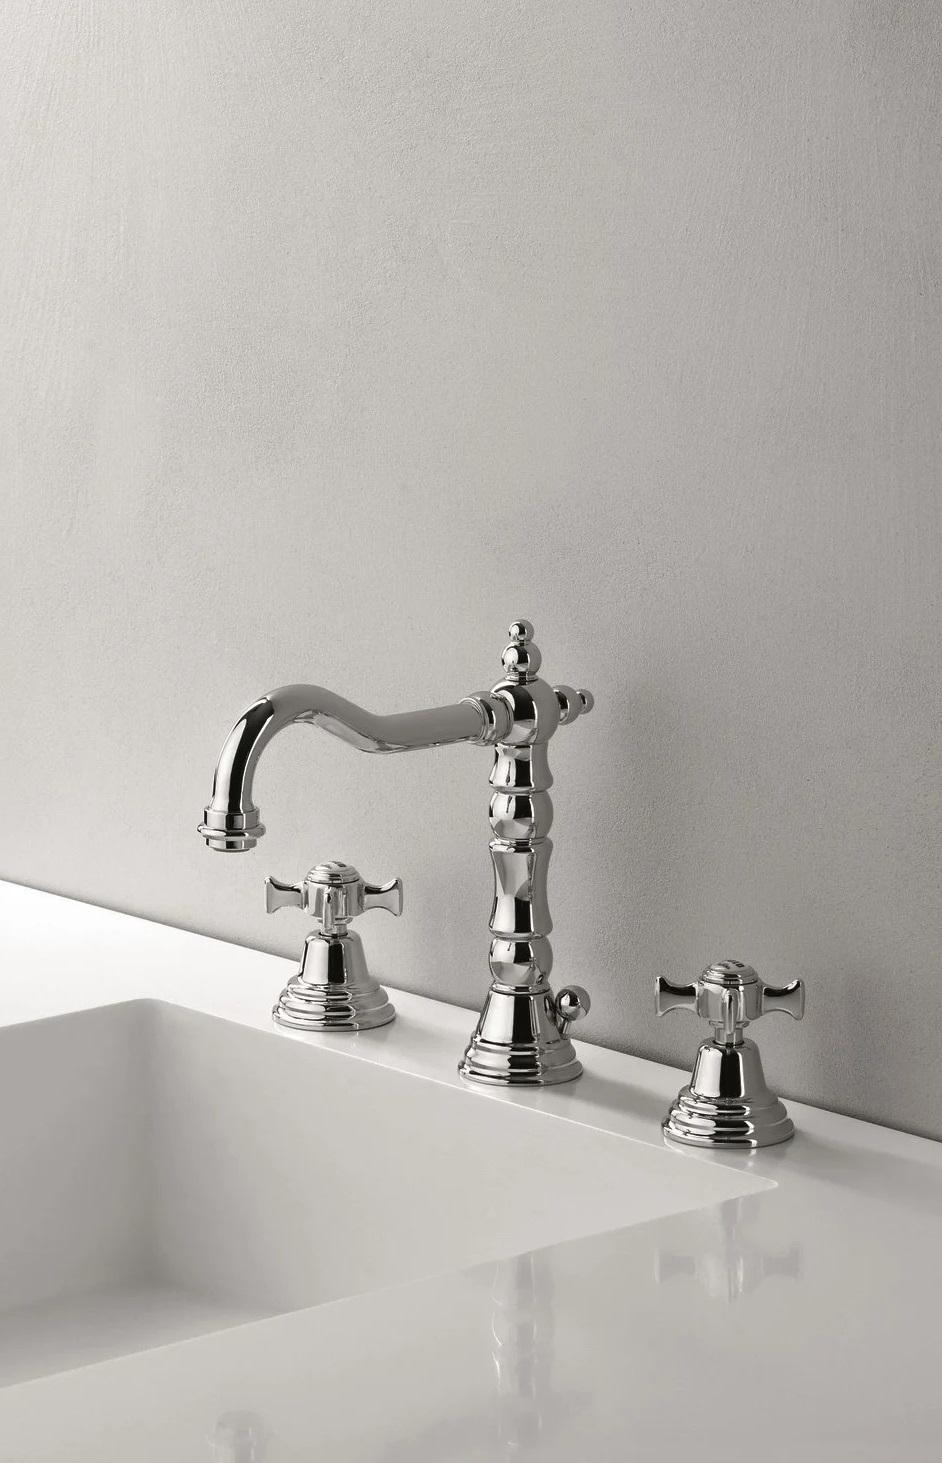 cristina-canova-lavabo-triforo-2